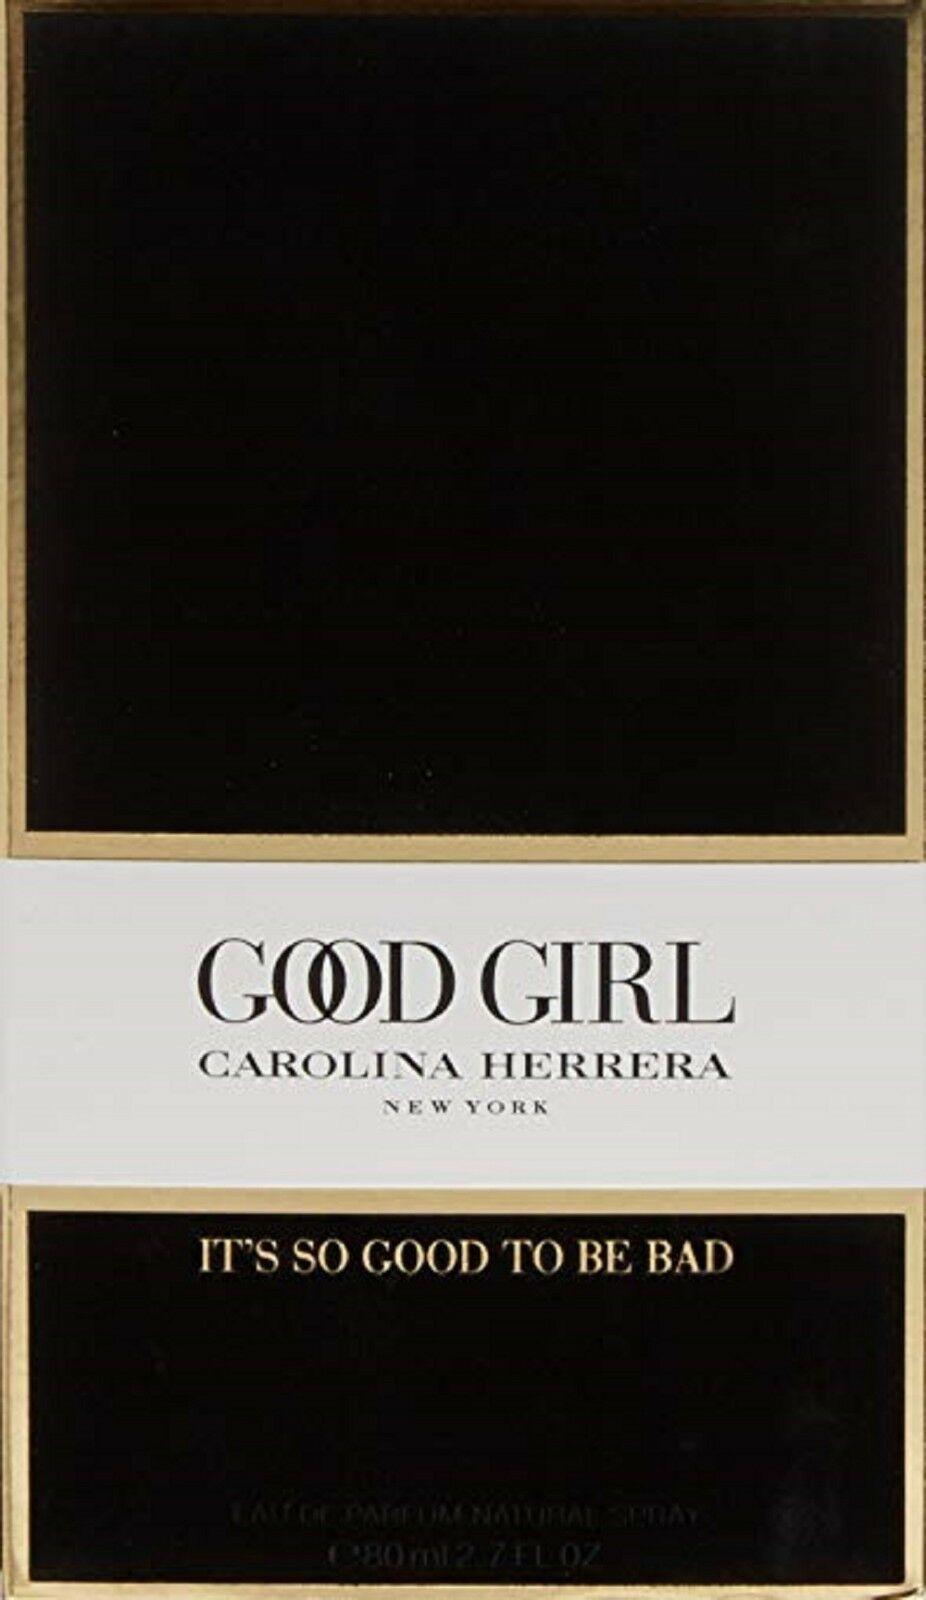 Good Girl by Carolina Herrera 2.7oz 80 ml EDP Perfume for Women *100% AUTHENTIC* image 5